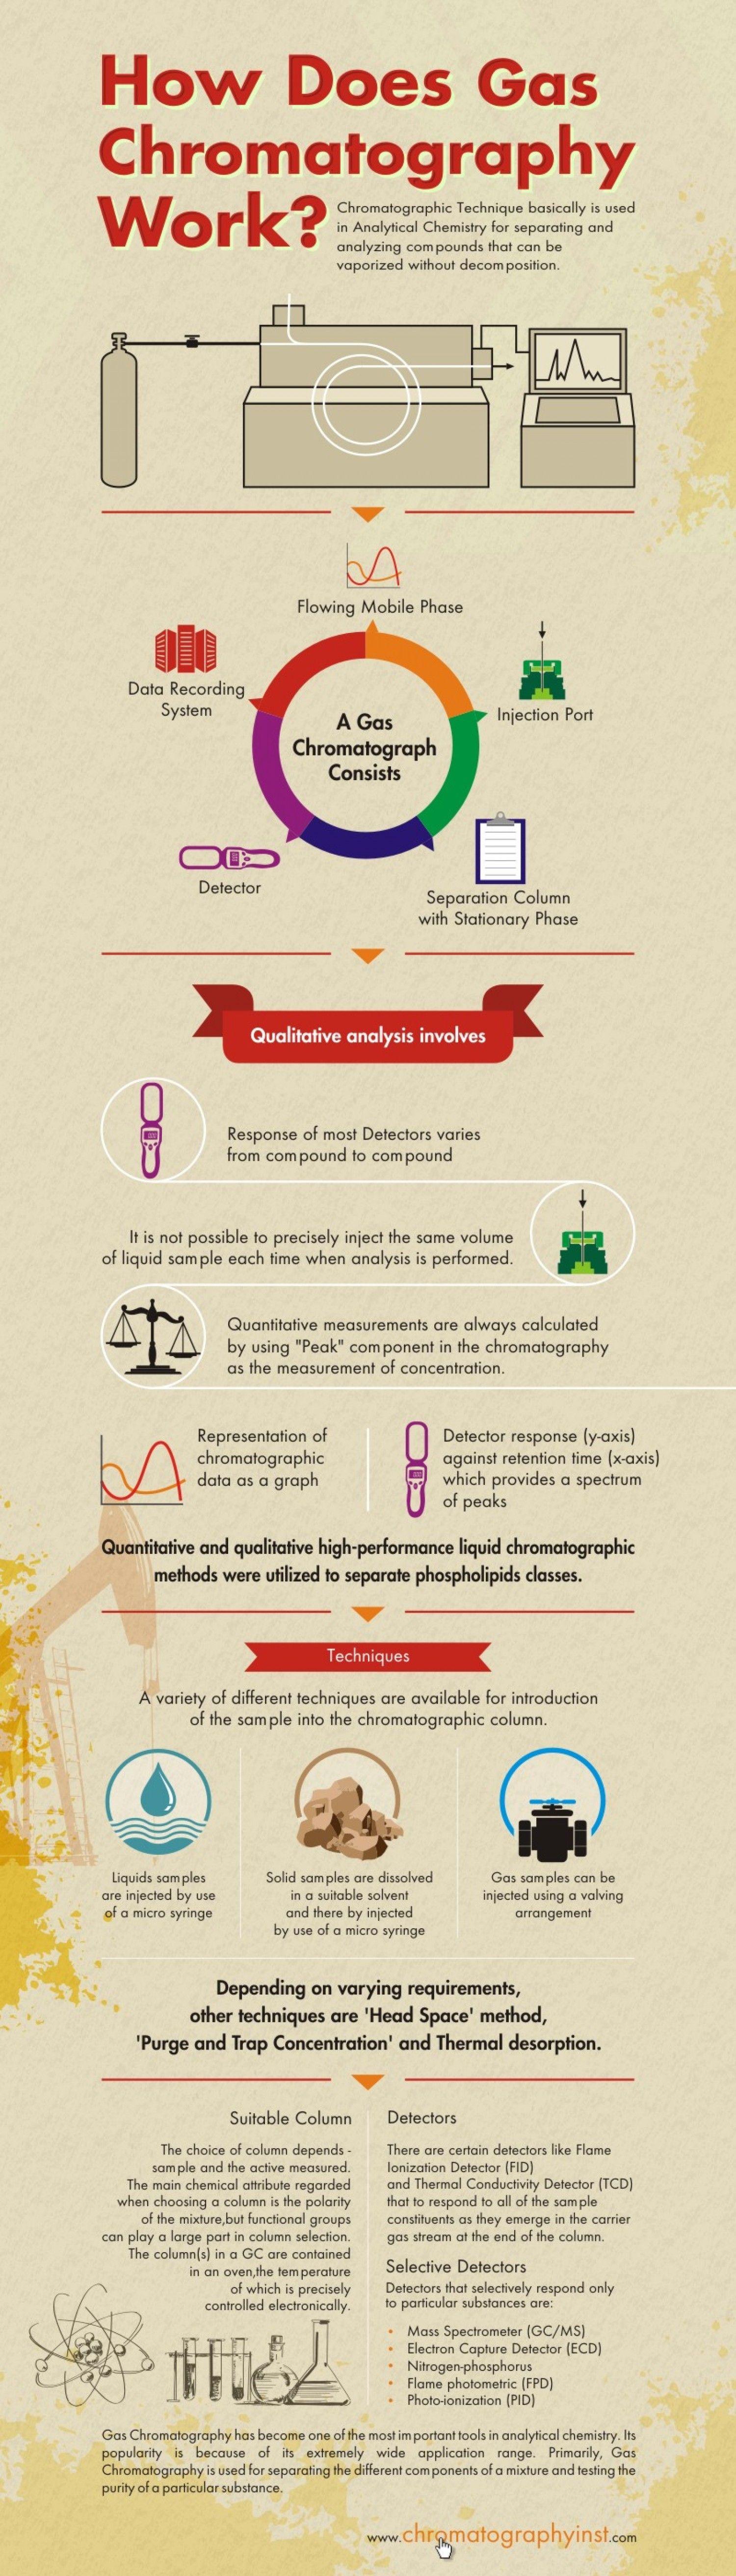 Cromatografia Gasosa Como Funciona